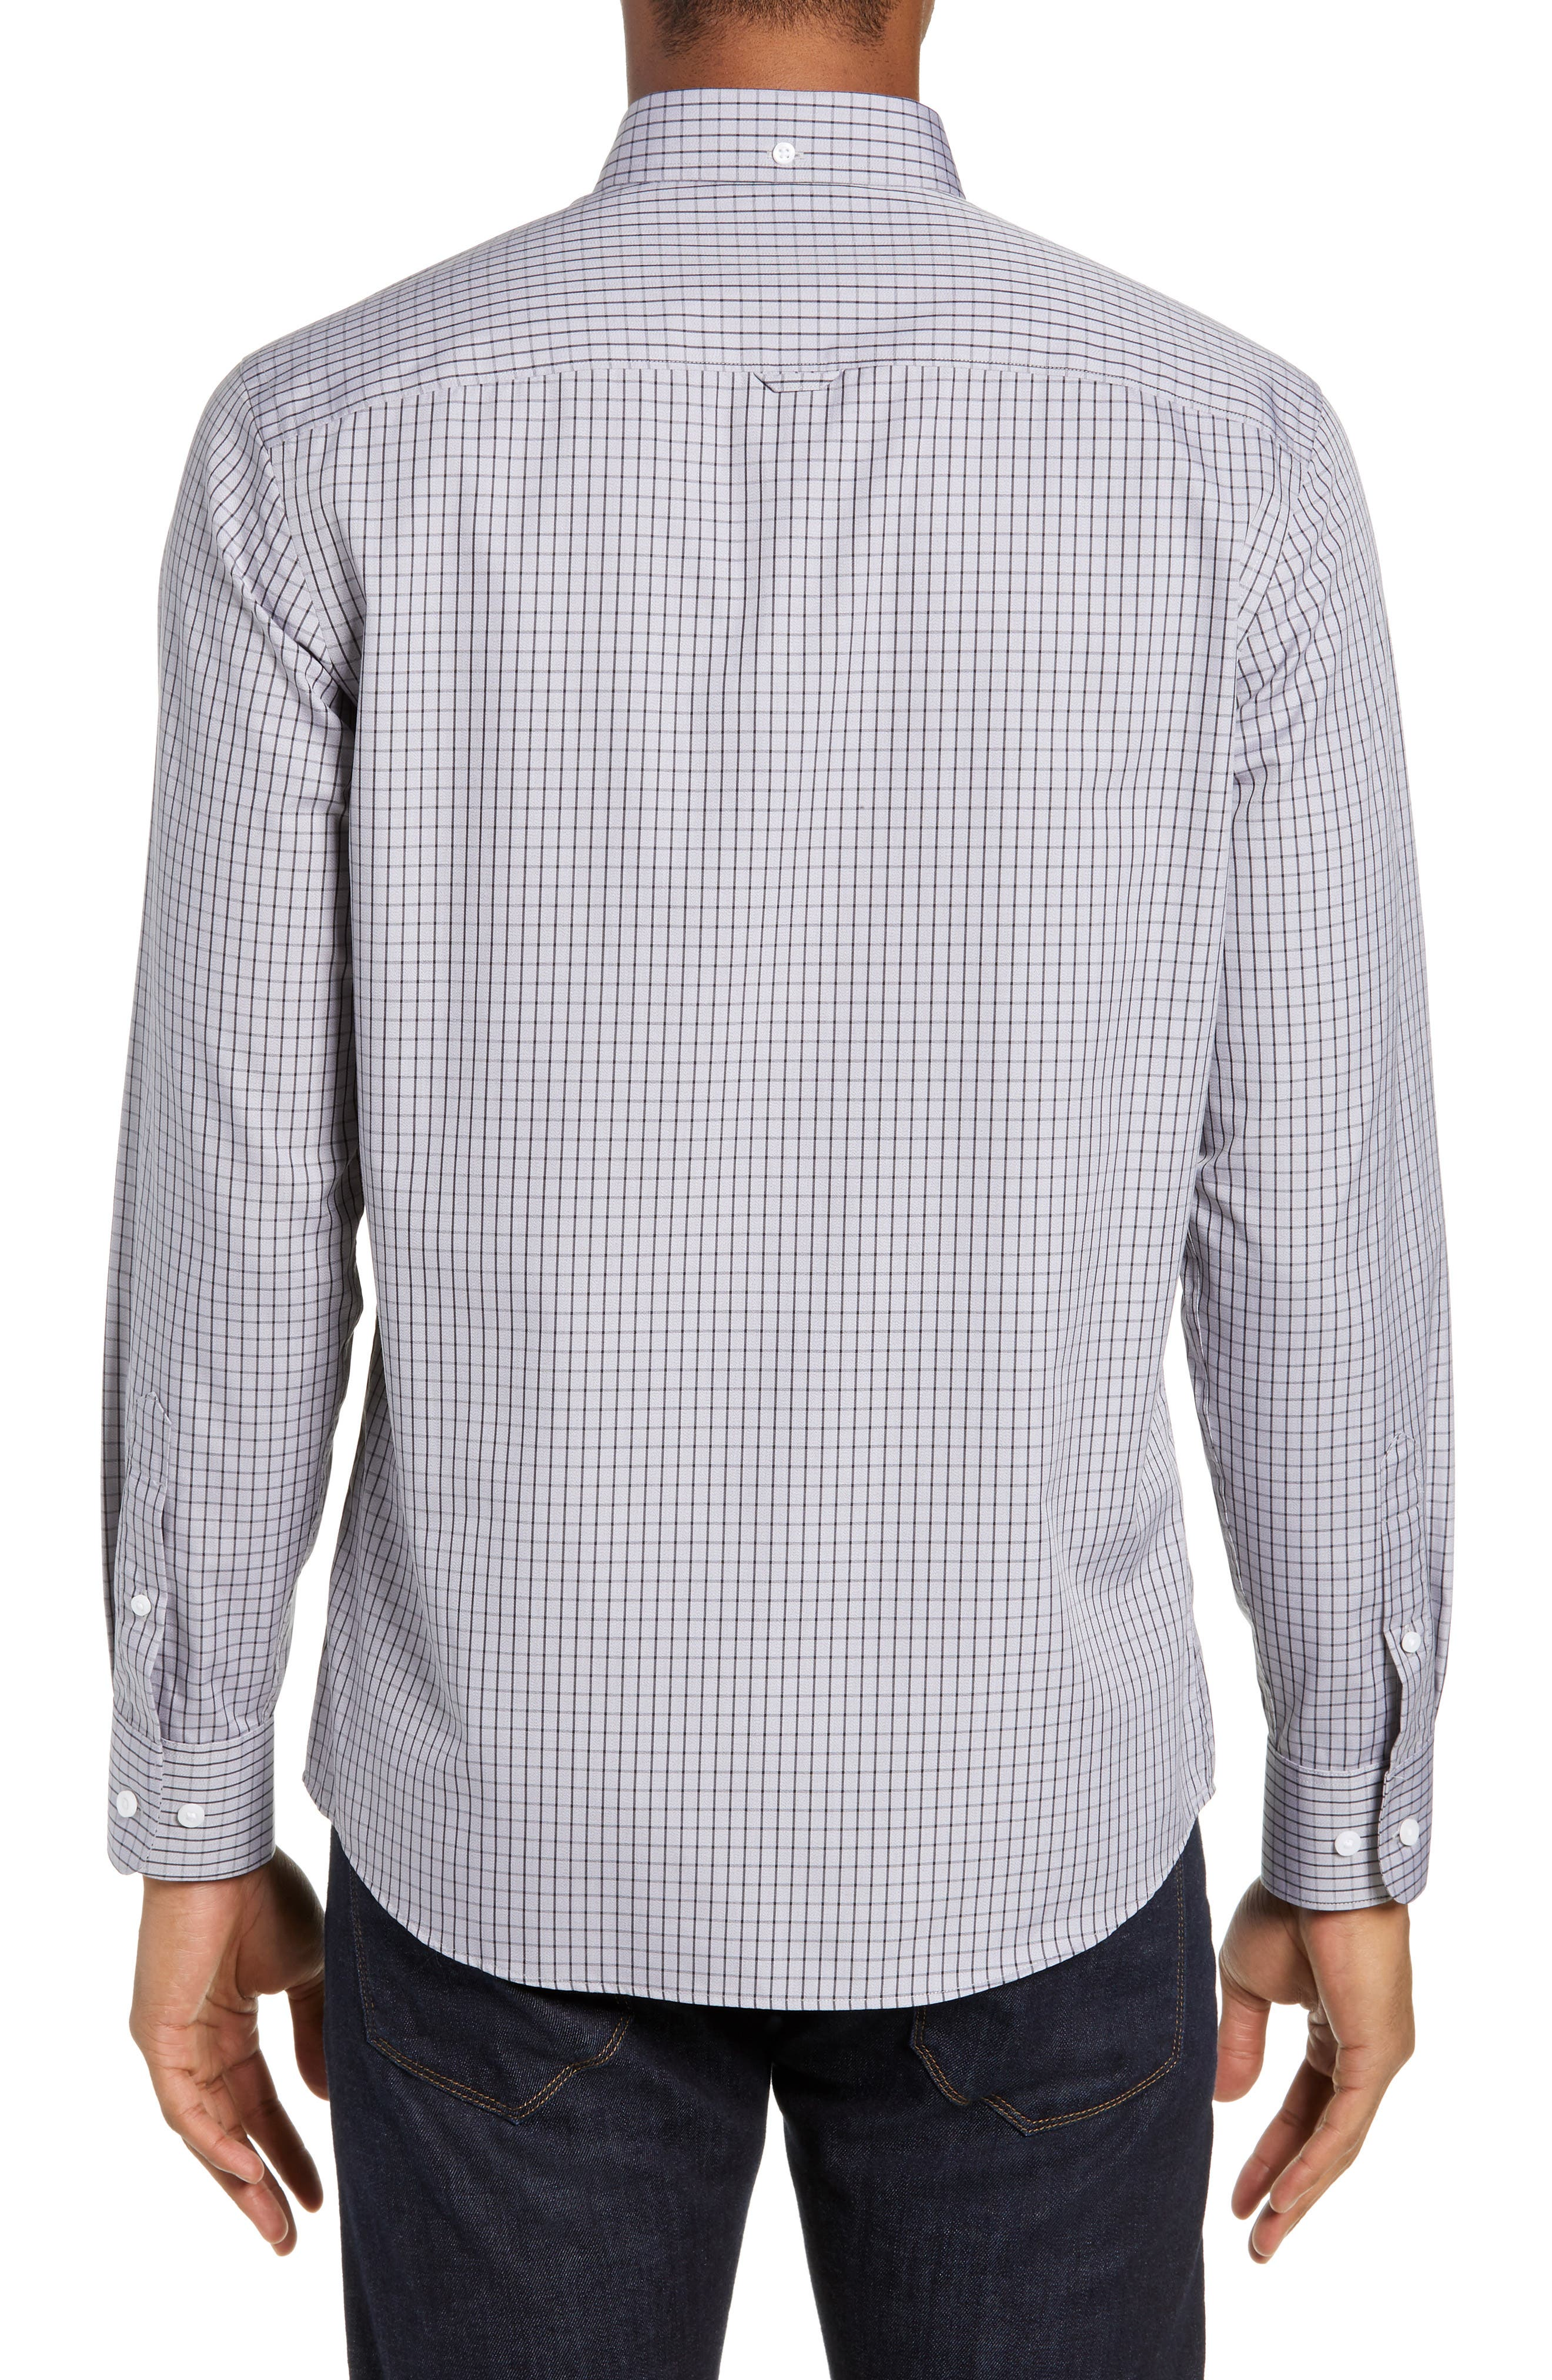 NORDSTROM MEN'S SHOP,                             Trim Fit Non-Iron Check Sport Shirt,                             Alternate thumbnail 3, color,                             GREY FILIGREE MINIGRID